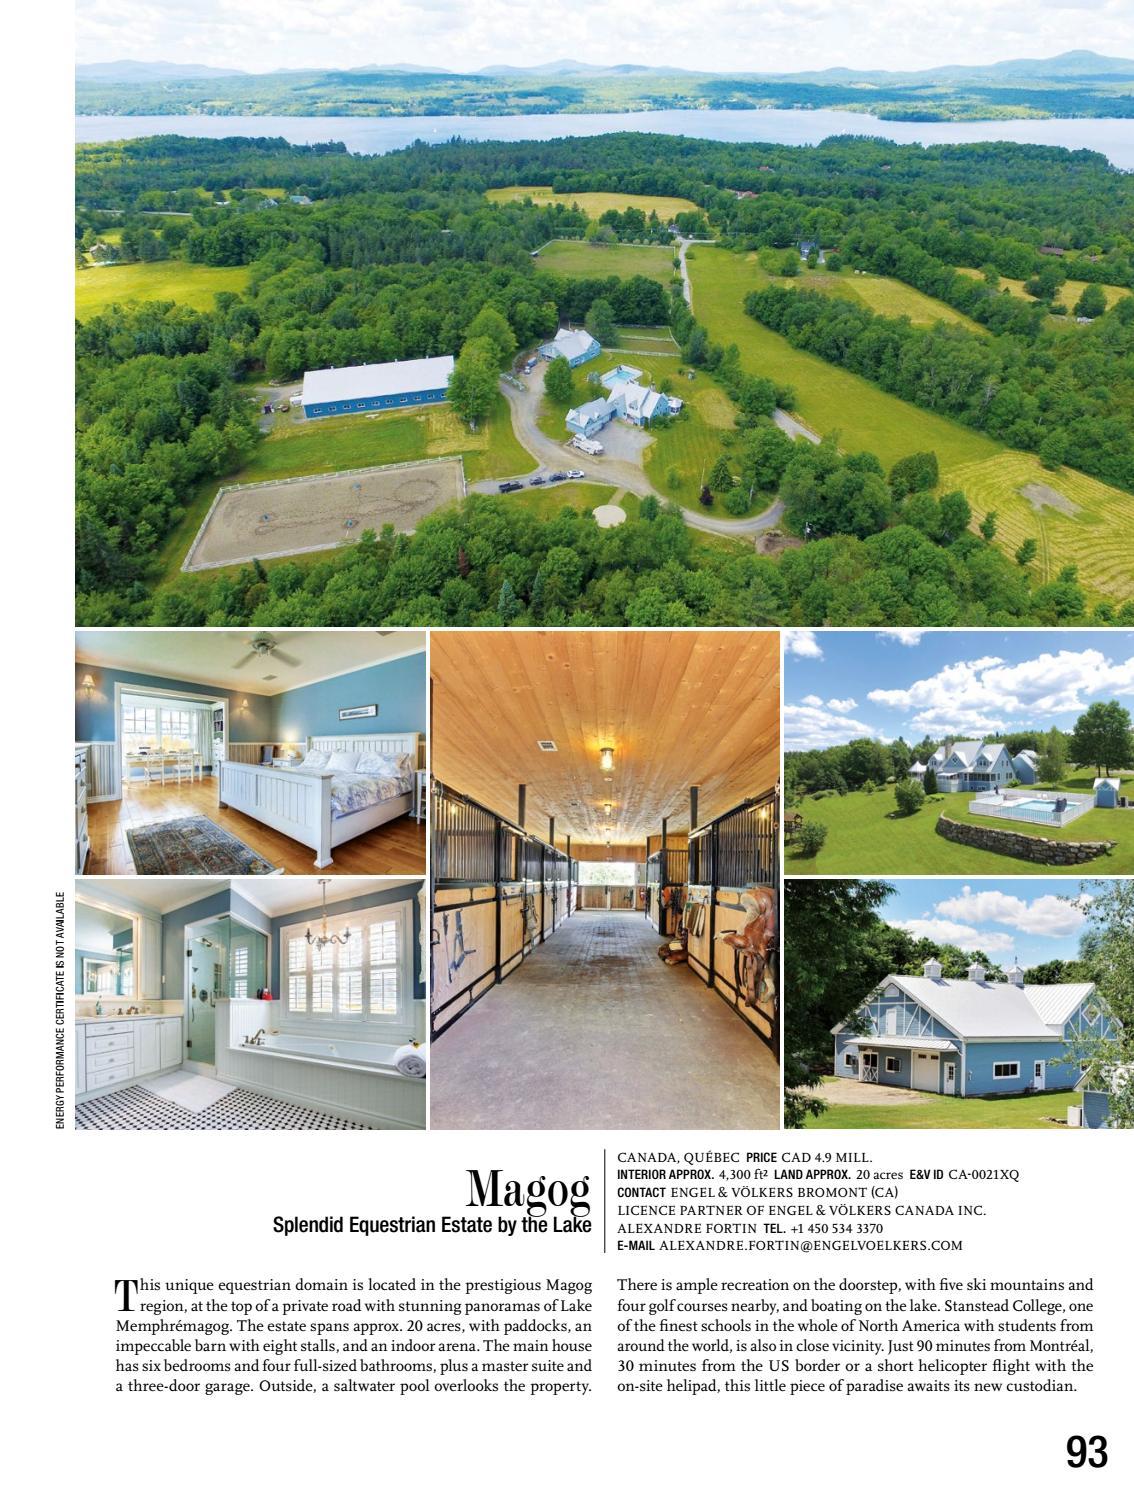 Lake Memphremagog Real Estate : memphremagog, estate, Magazine, 03/17, (english), GG-Magazine, Issuu